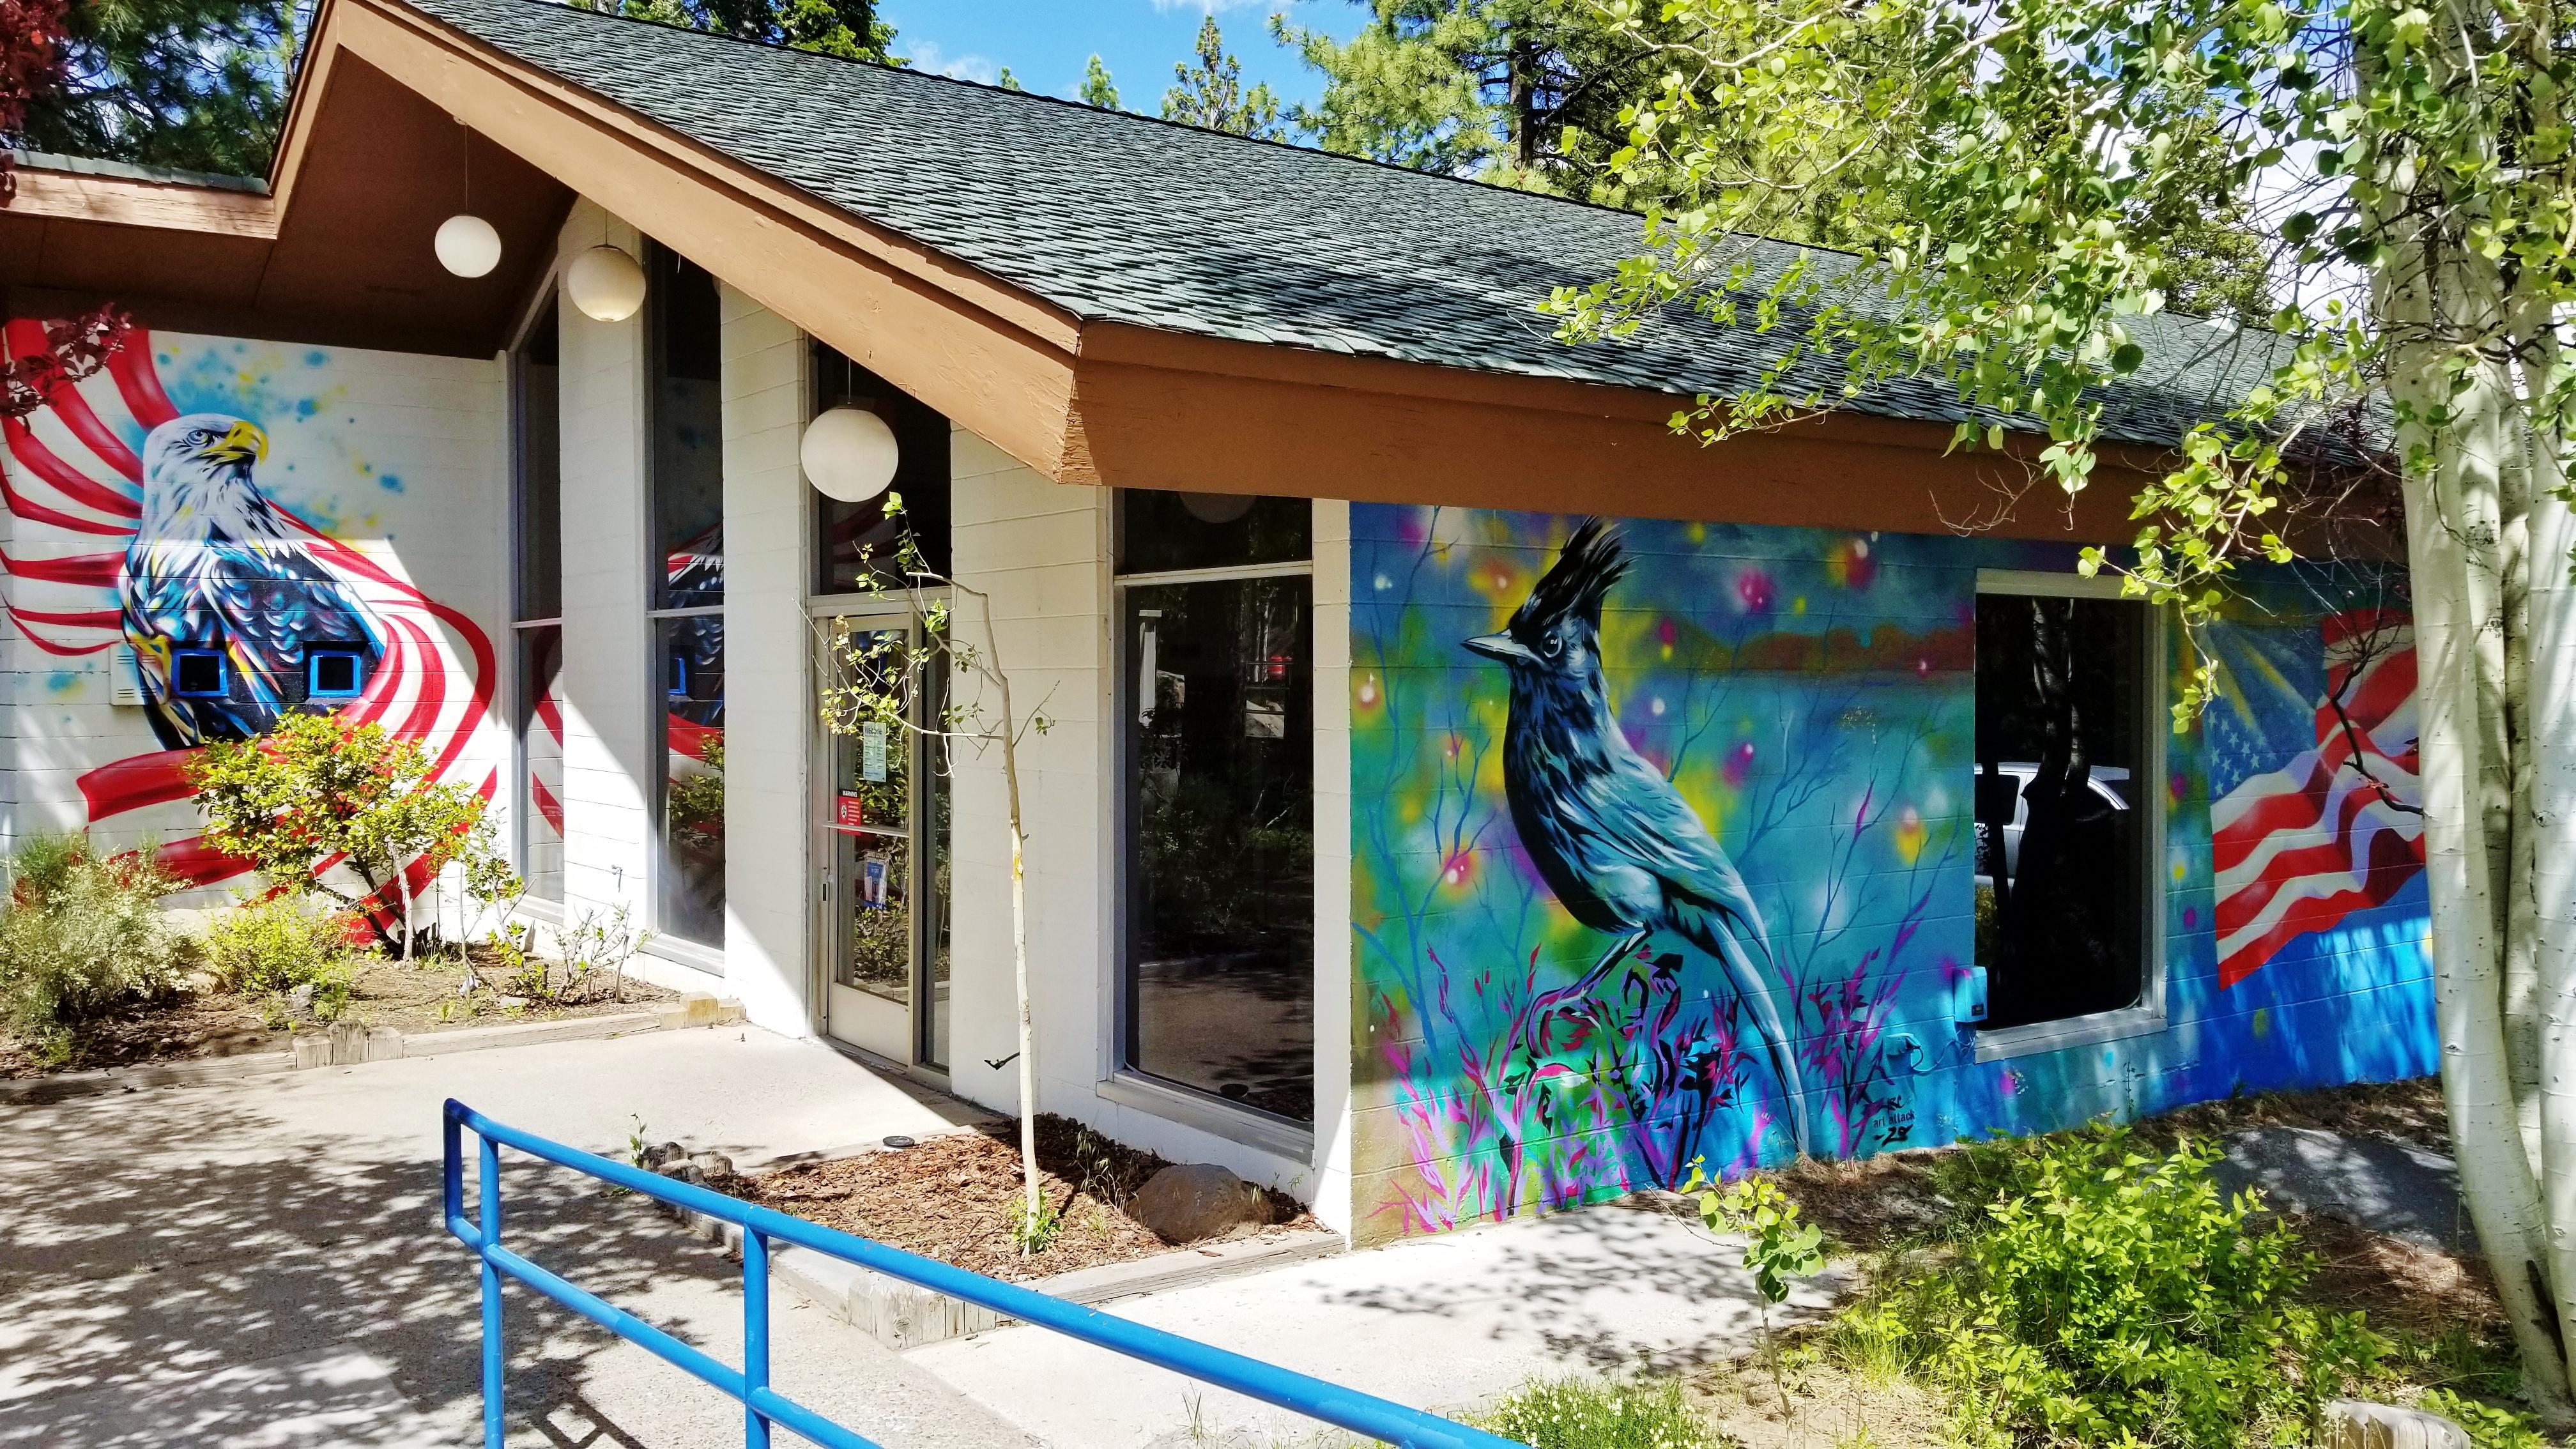 Crystal Bay Post Office